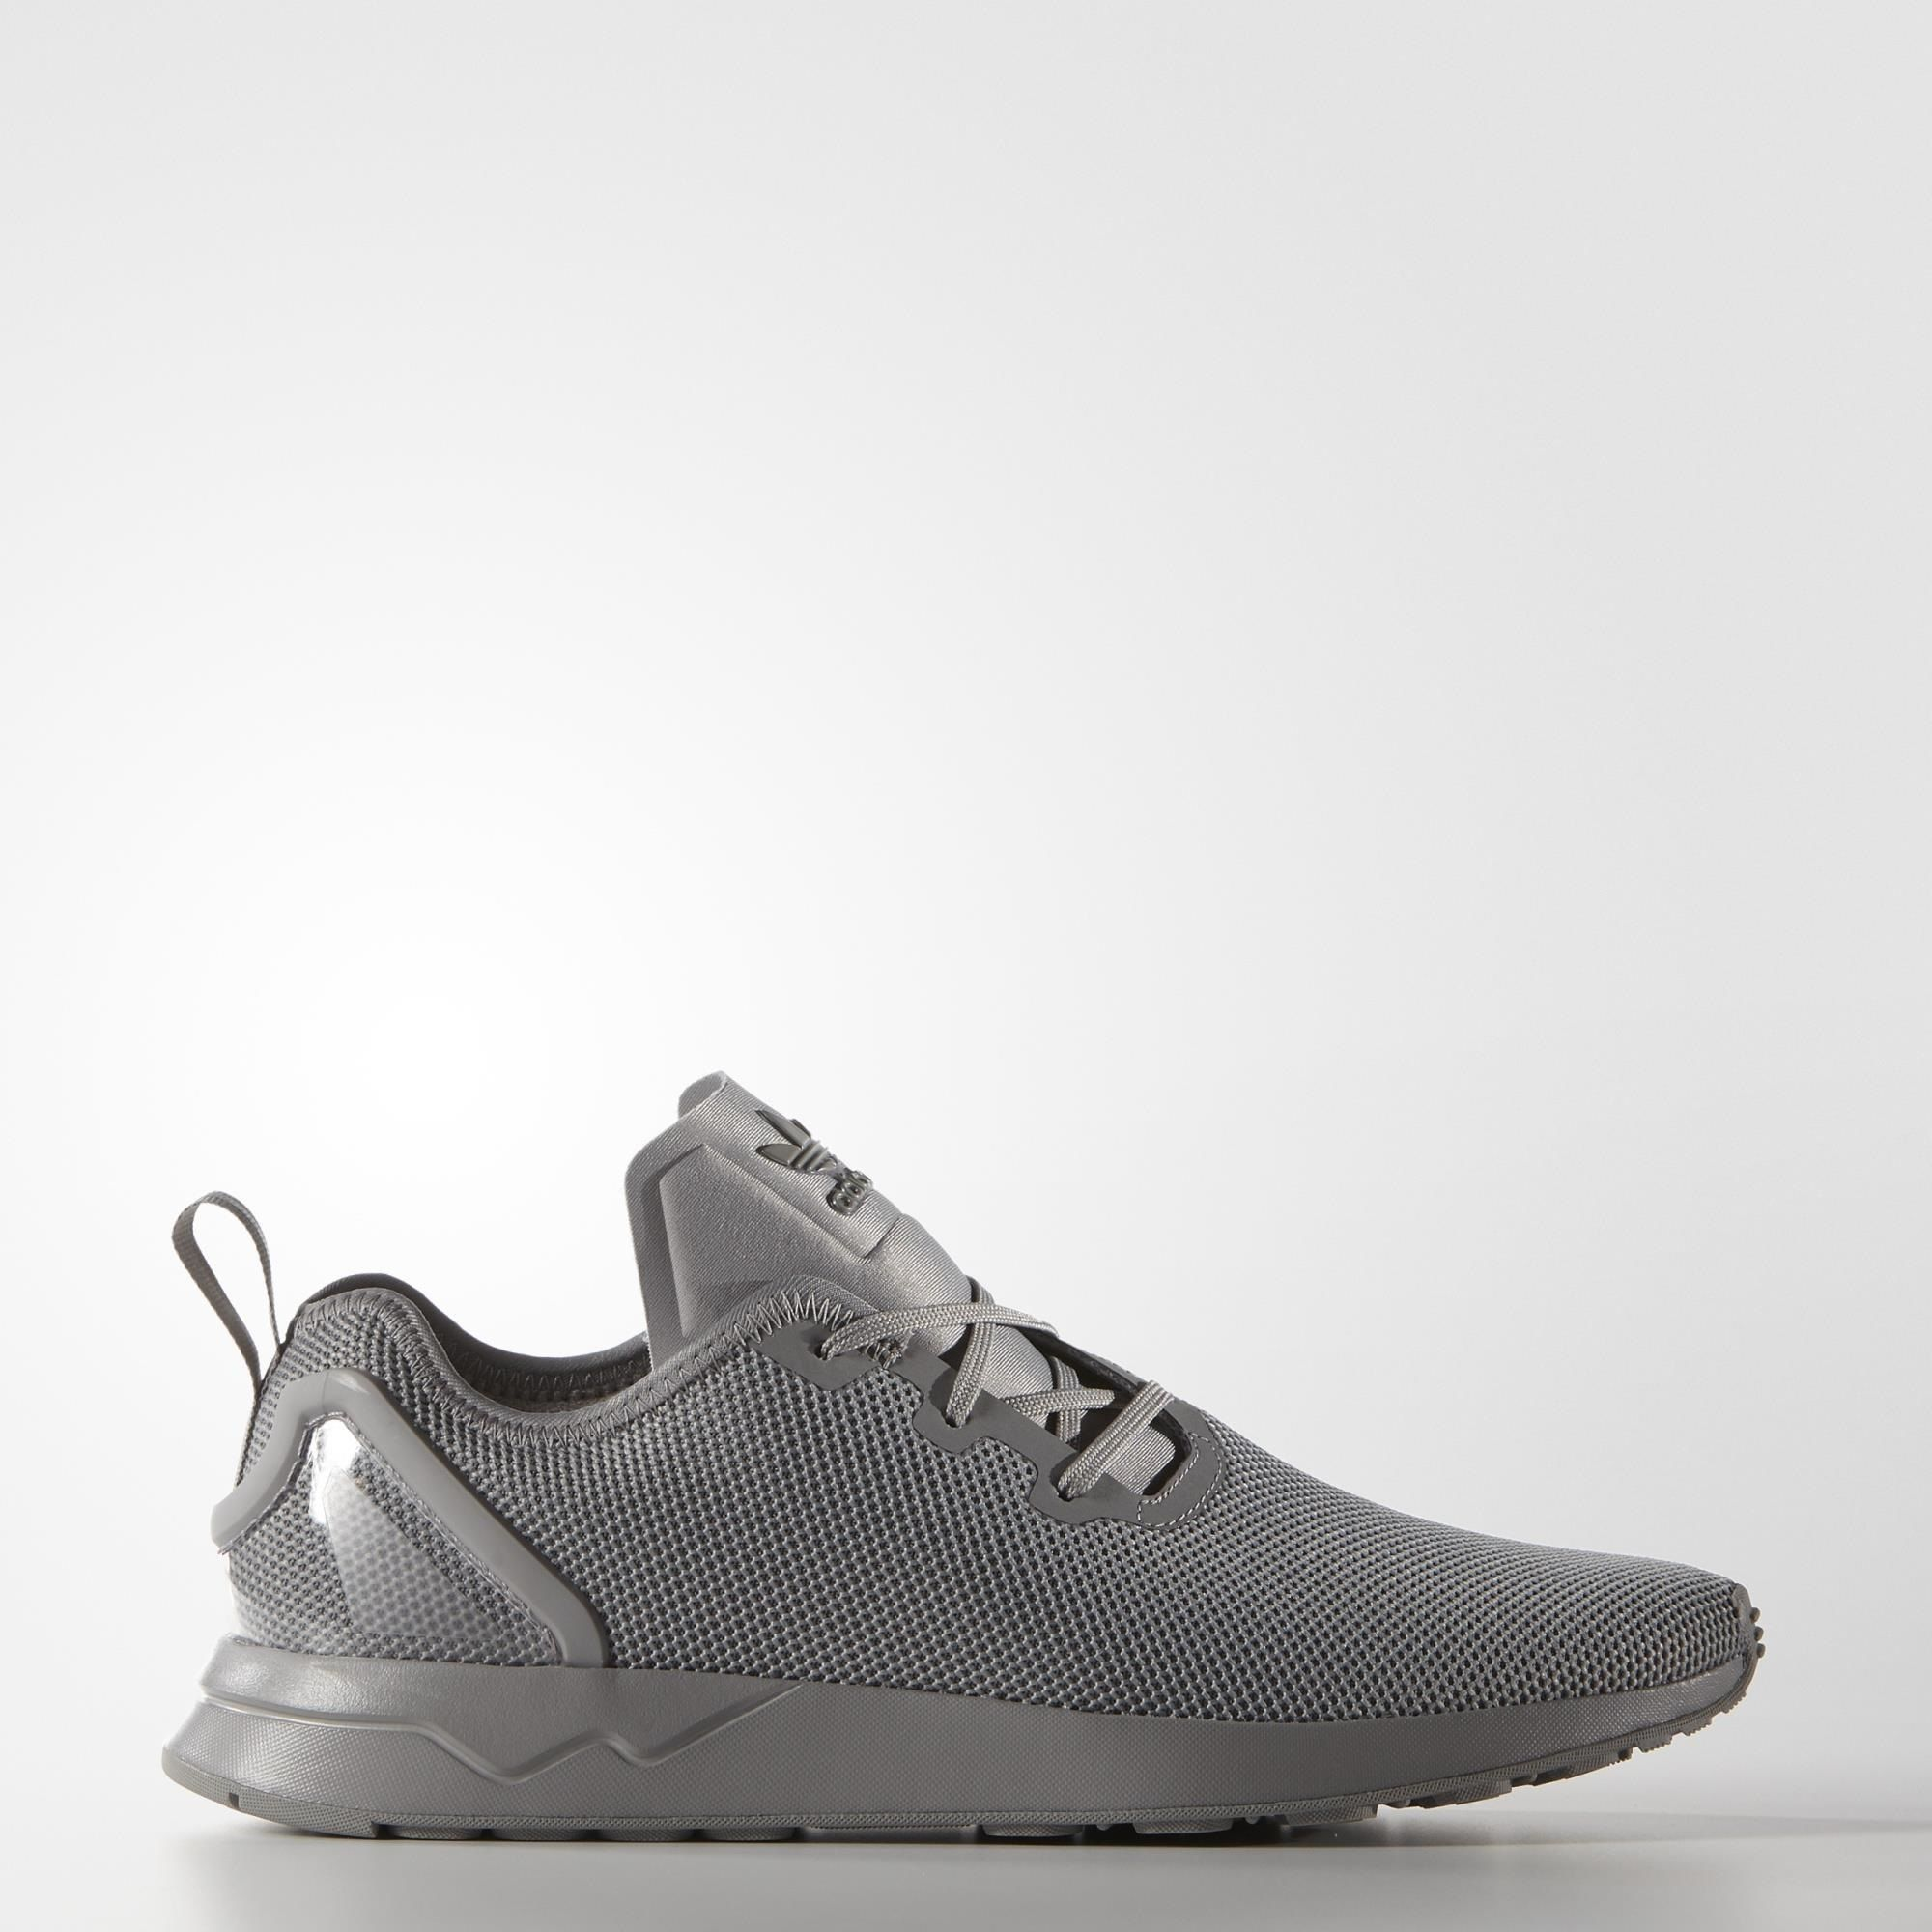 Adidas Men Asymmetrical ZX Flux Grey